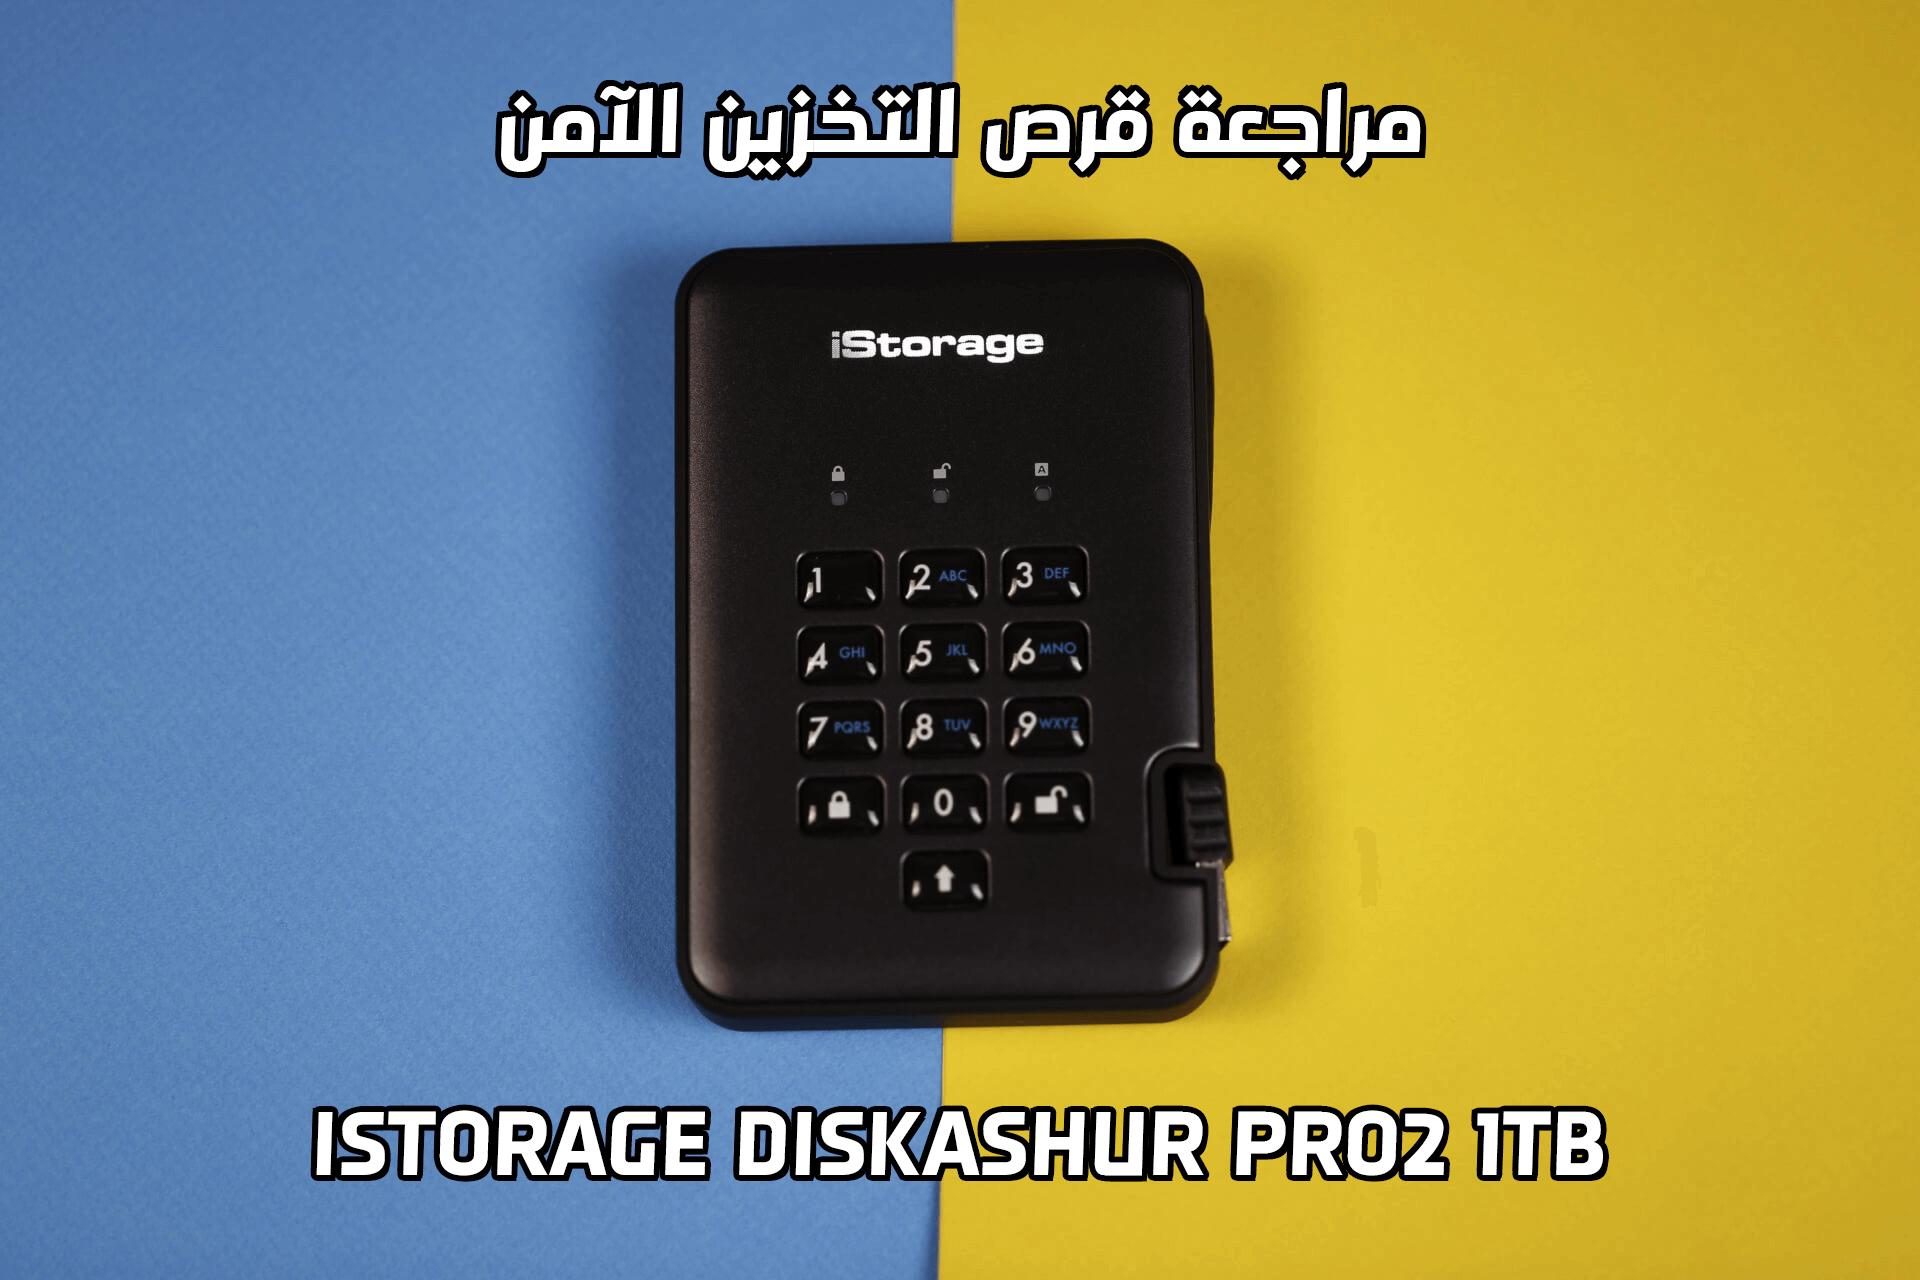 Istorage diskAshur Pro2 1TB